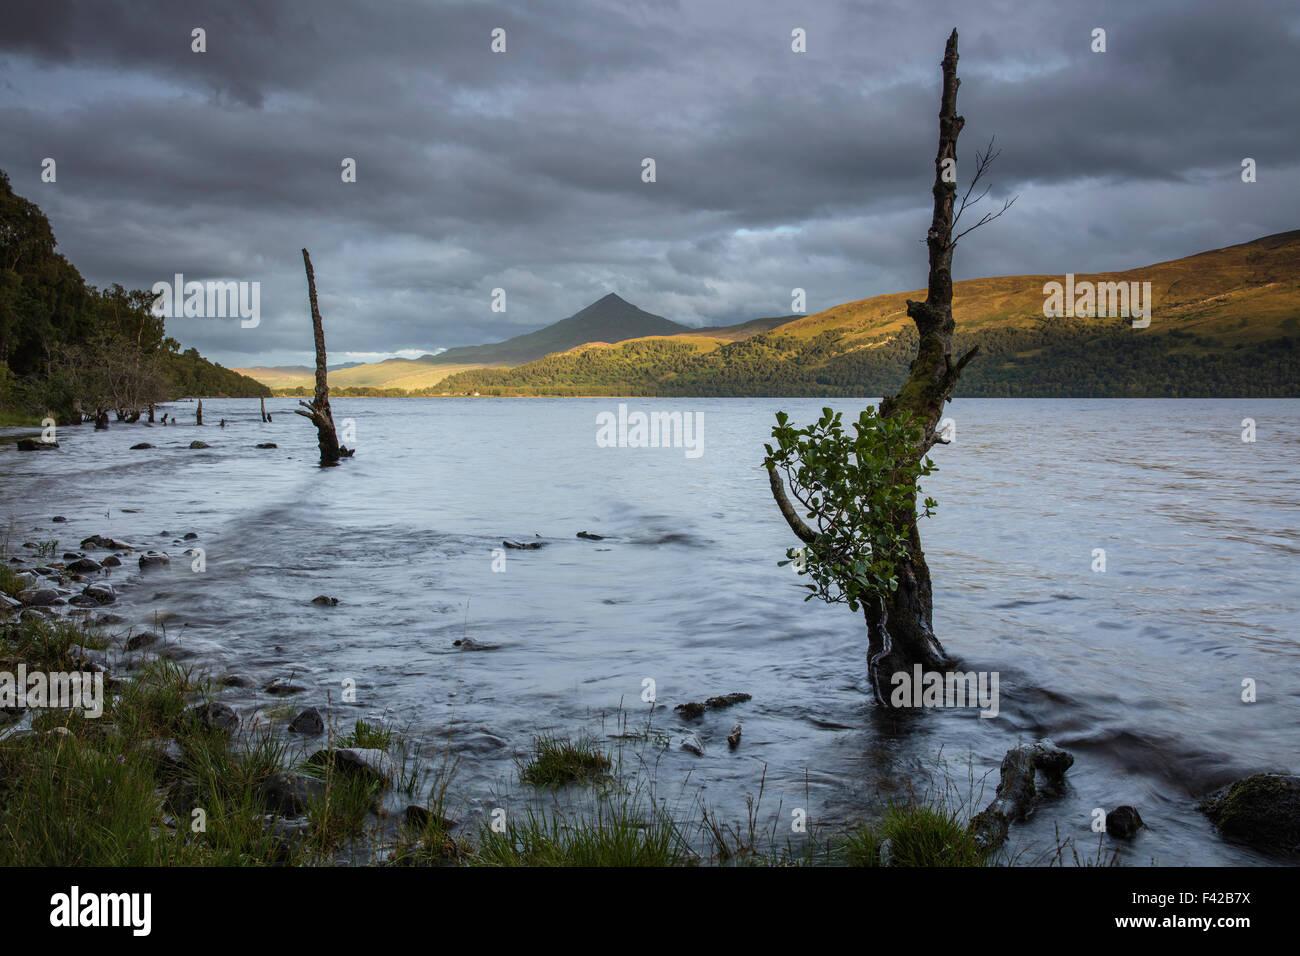 Schiehallion and Loch Rannoch, Perth and Kinross, Scotland, UK - Stock Image